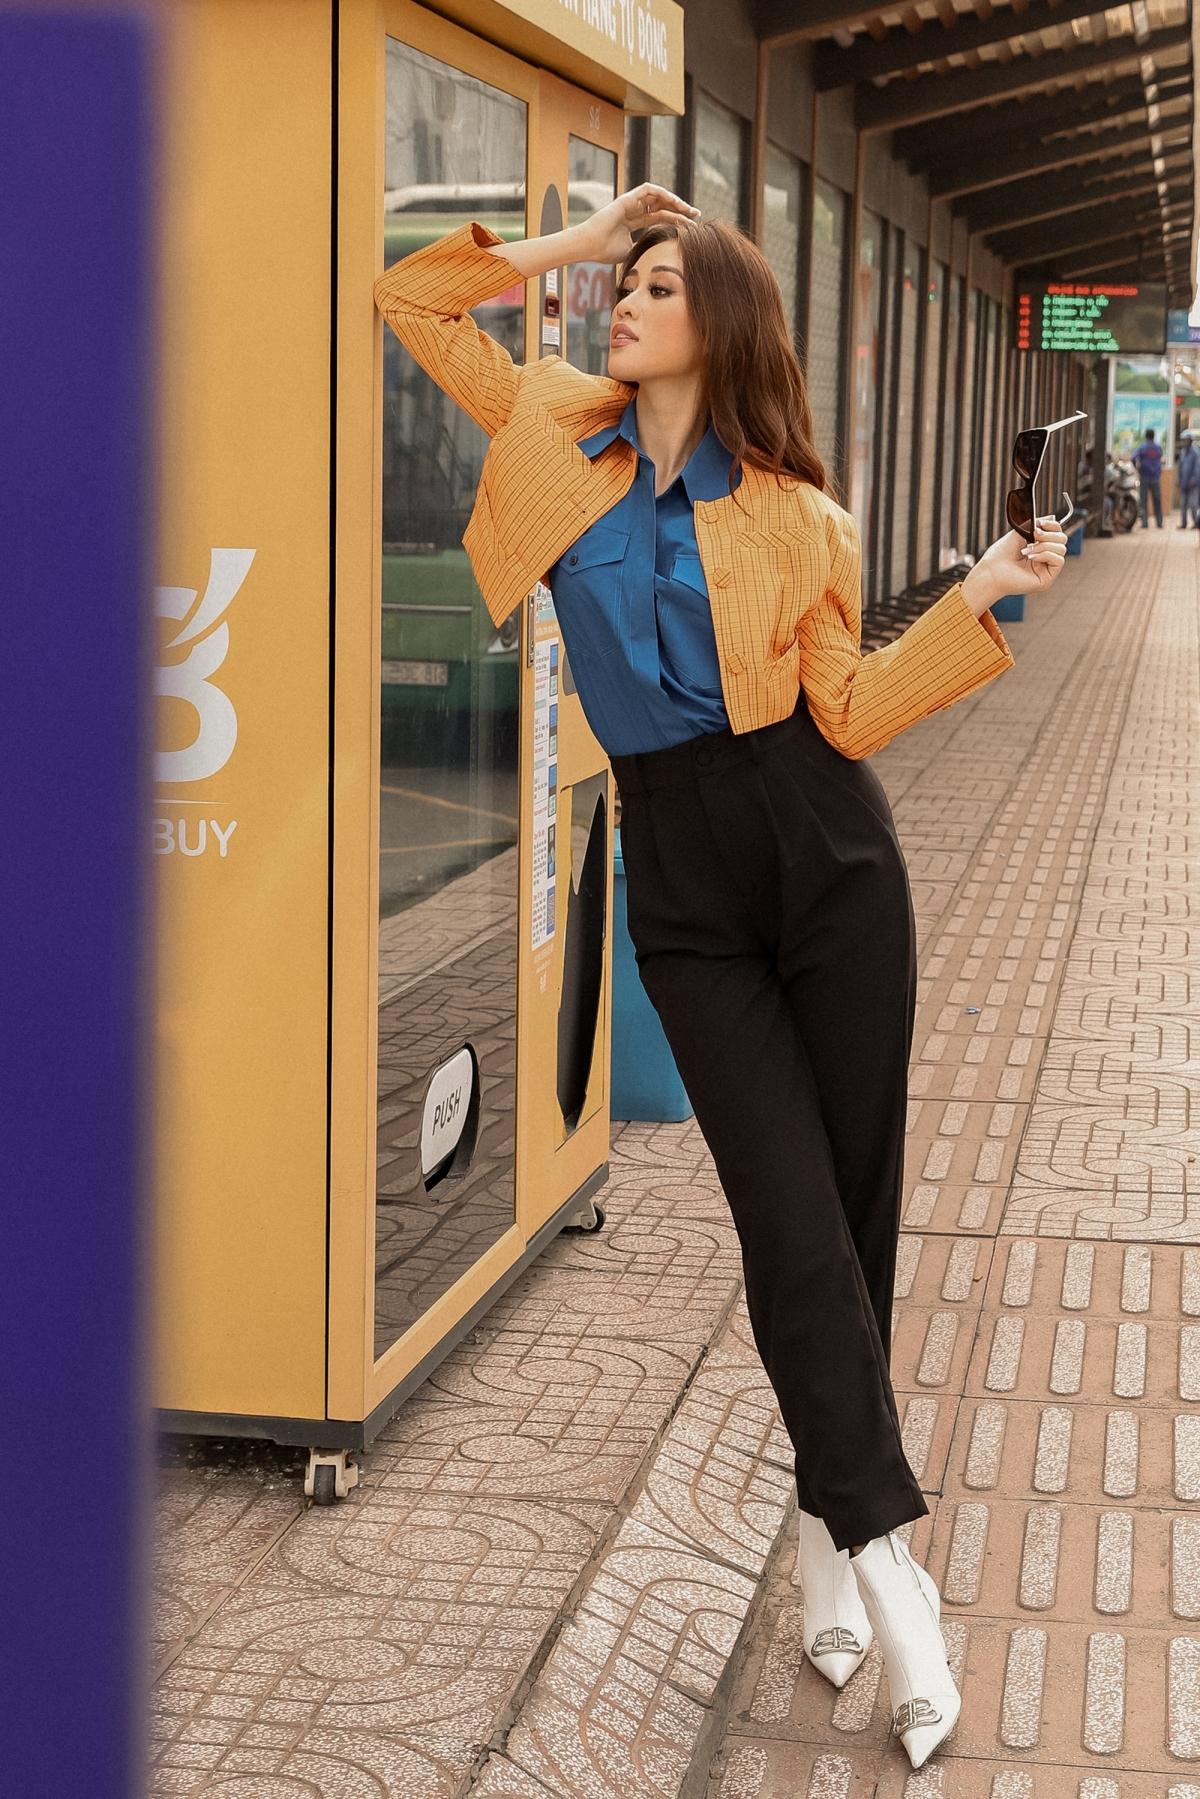 hoa_hau_khanh_van_street_style13.jpg